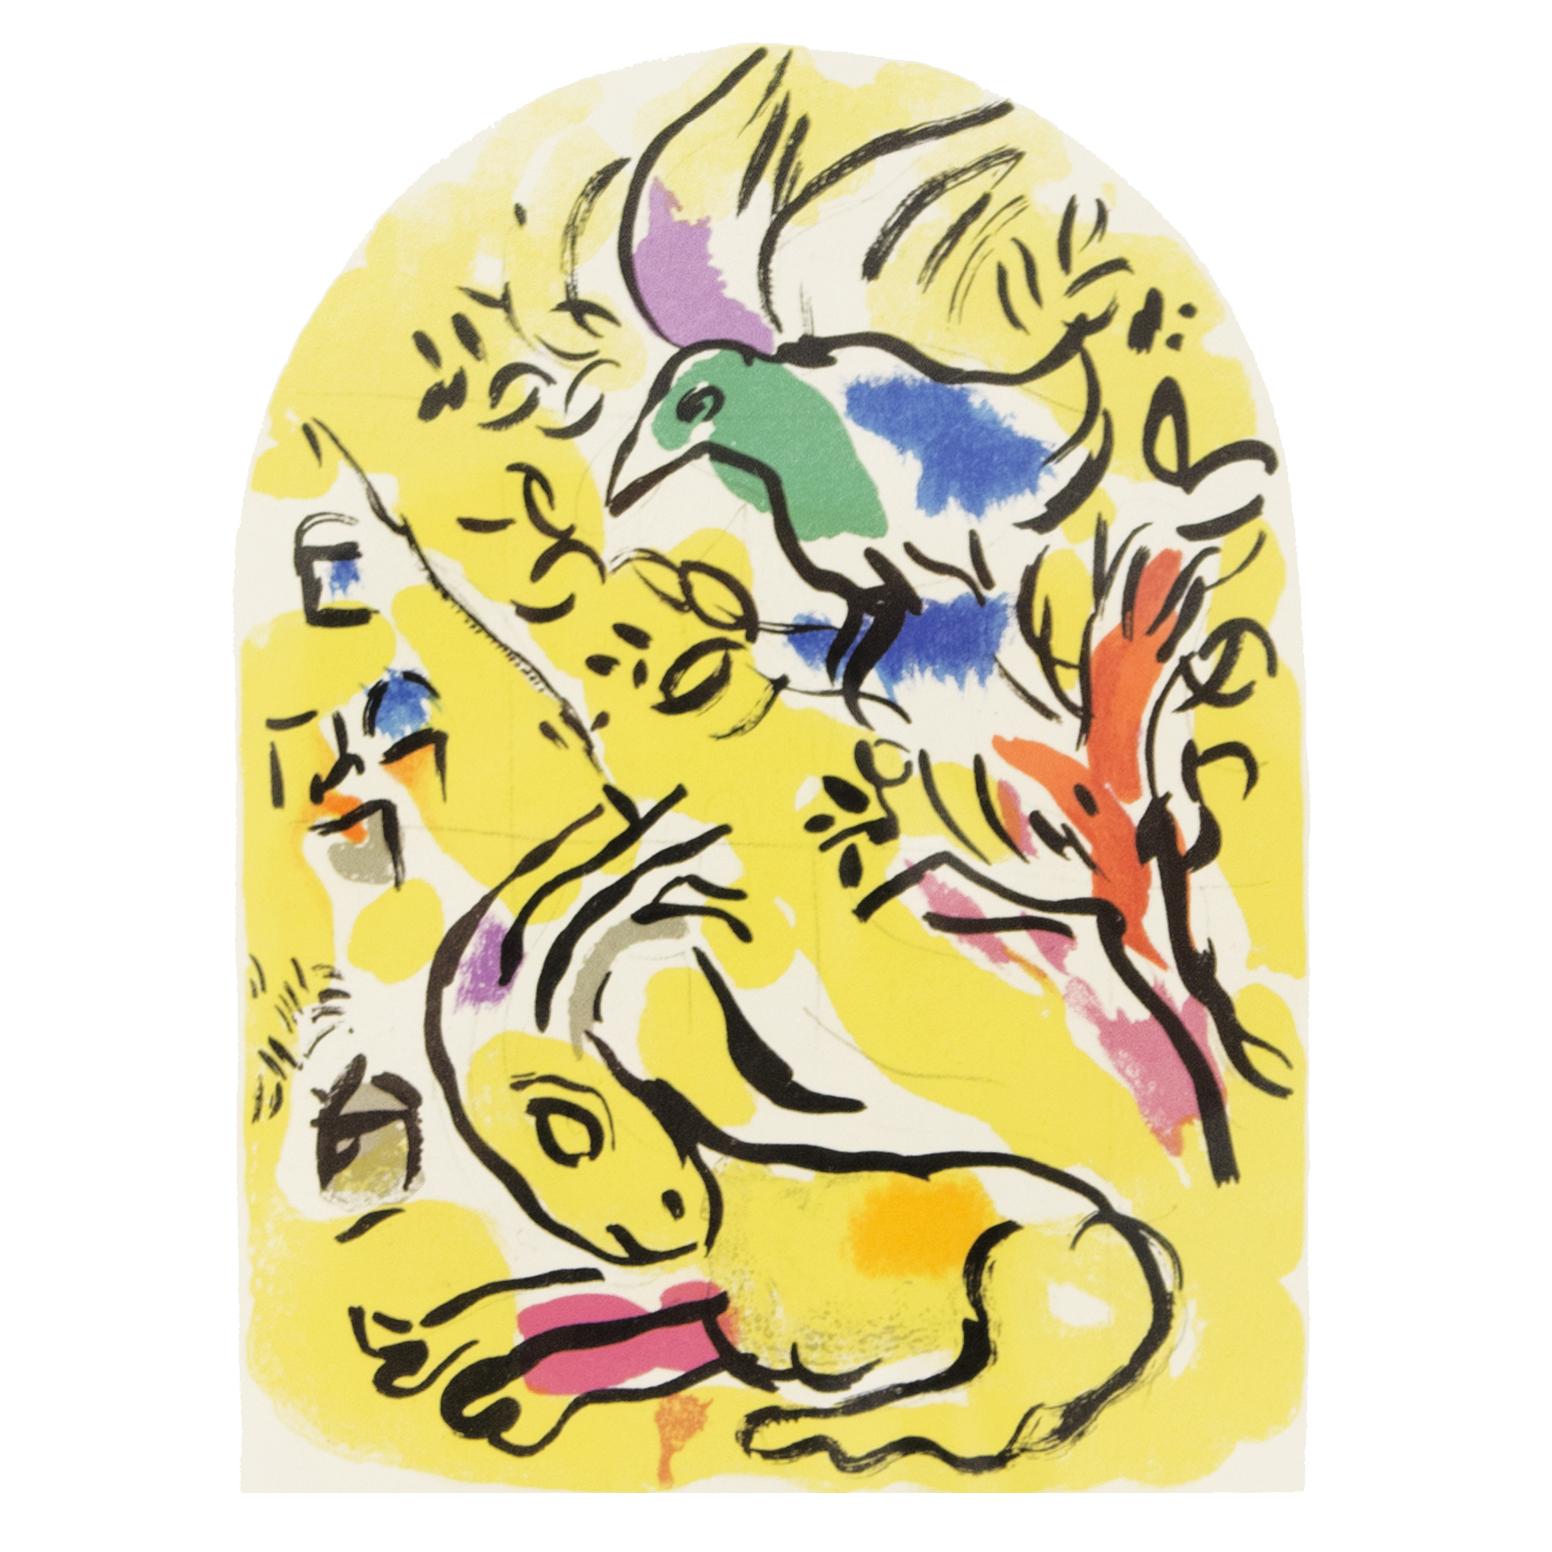 marc-chagall-tribe-of-naphtali-3rd-state-jerusalem-windows-lithograph-unframed-web.jpg